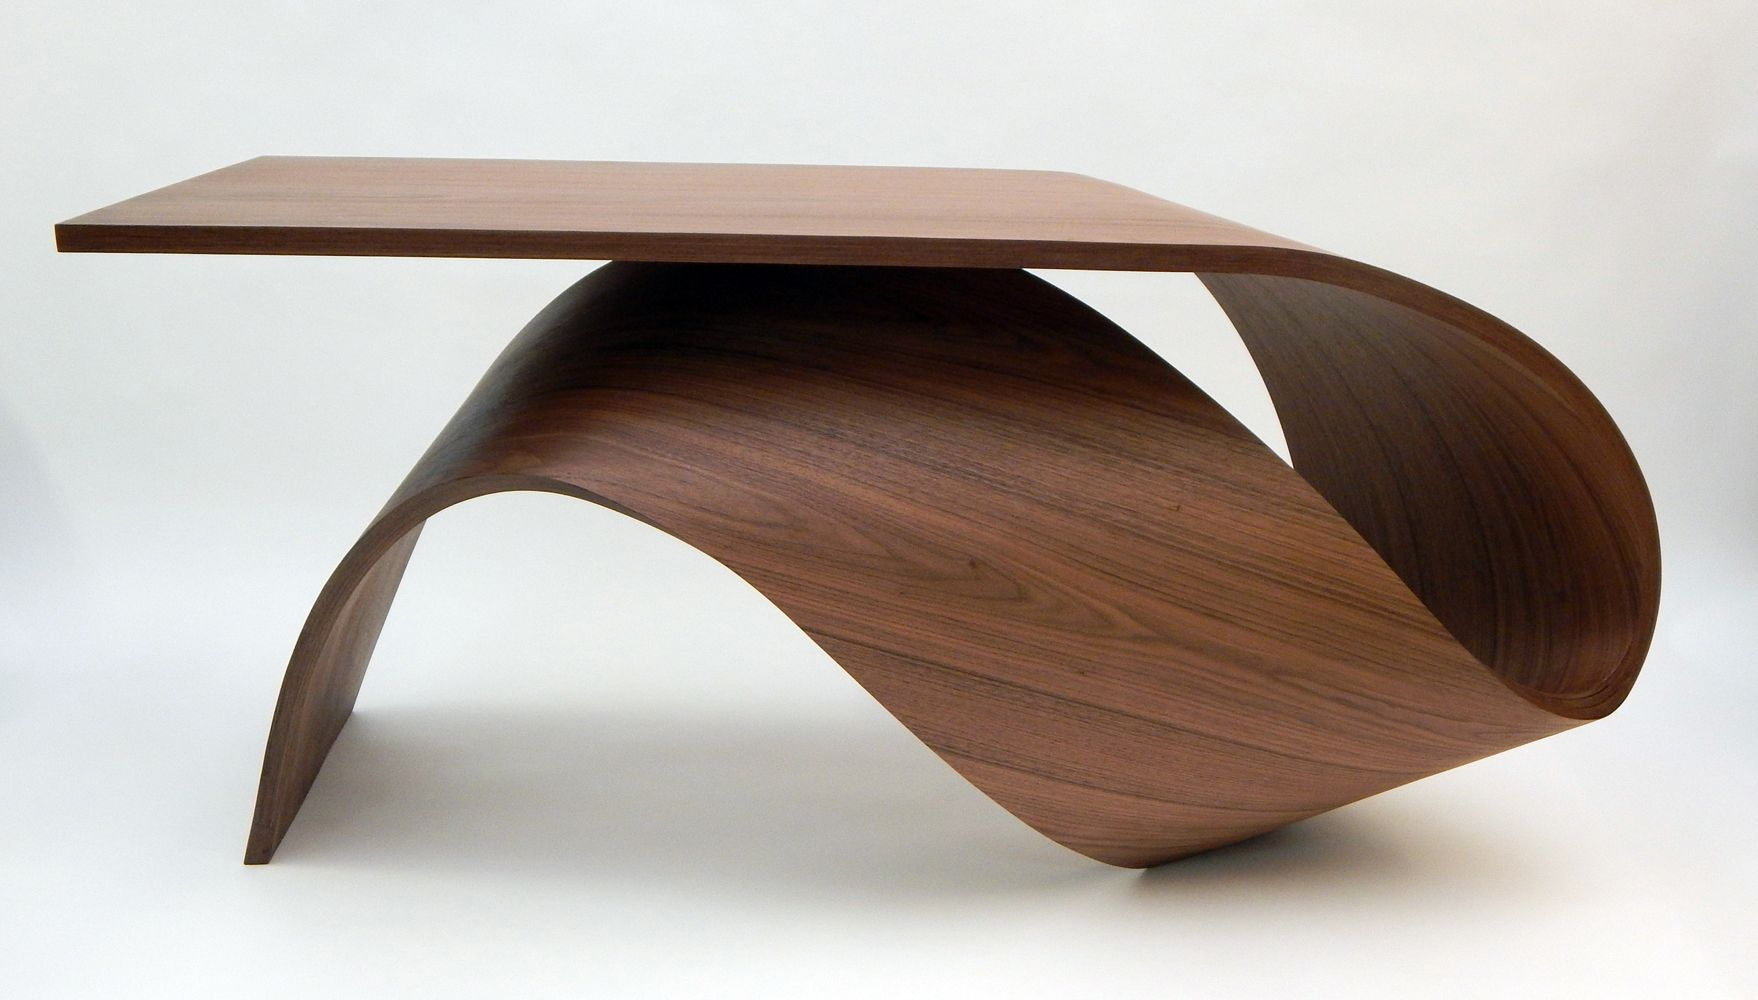 Curved wood furniture design images for French furniture designers modern